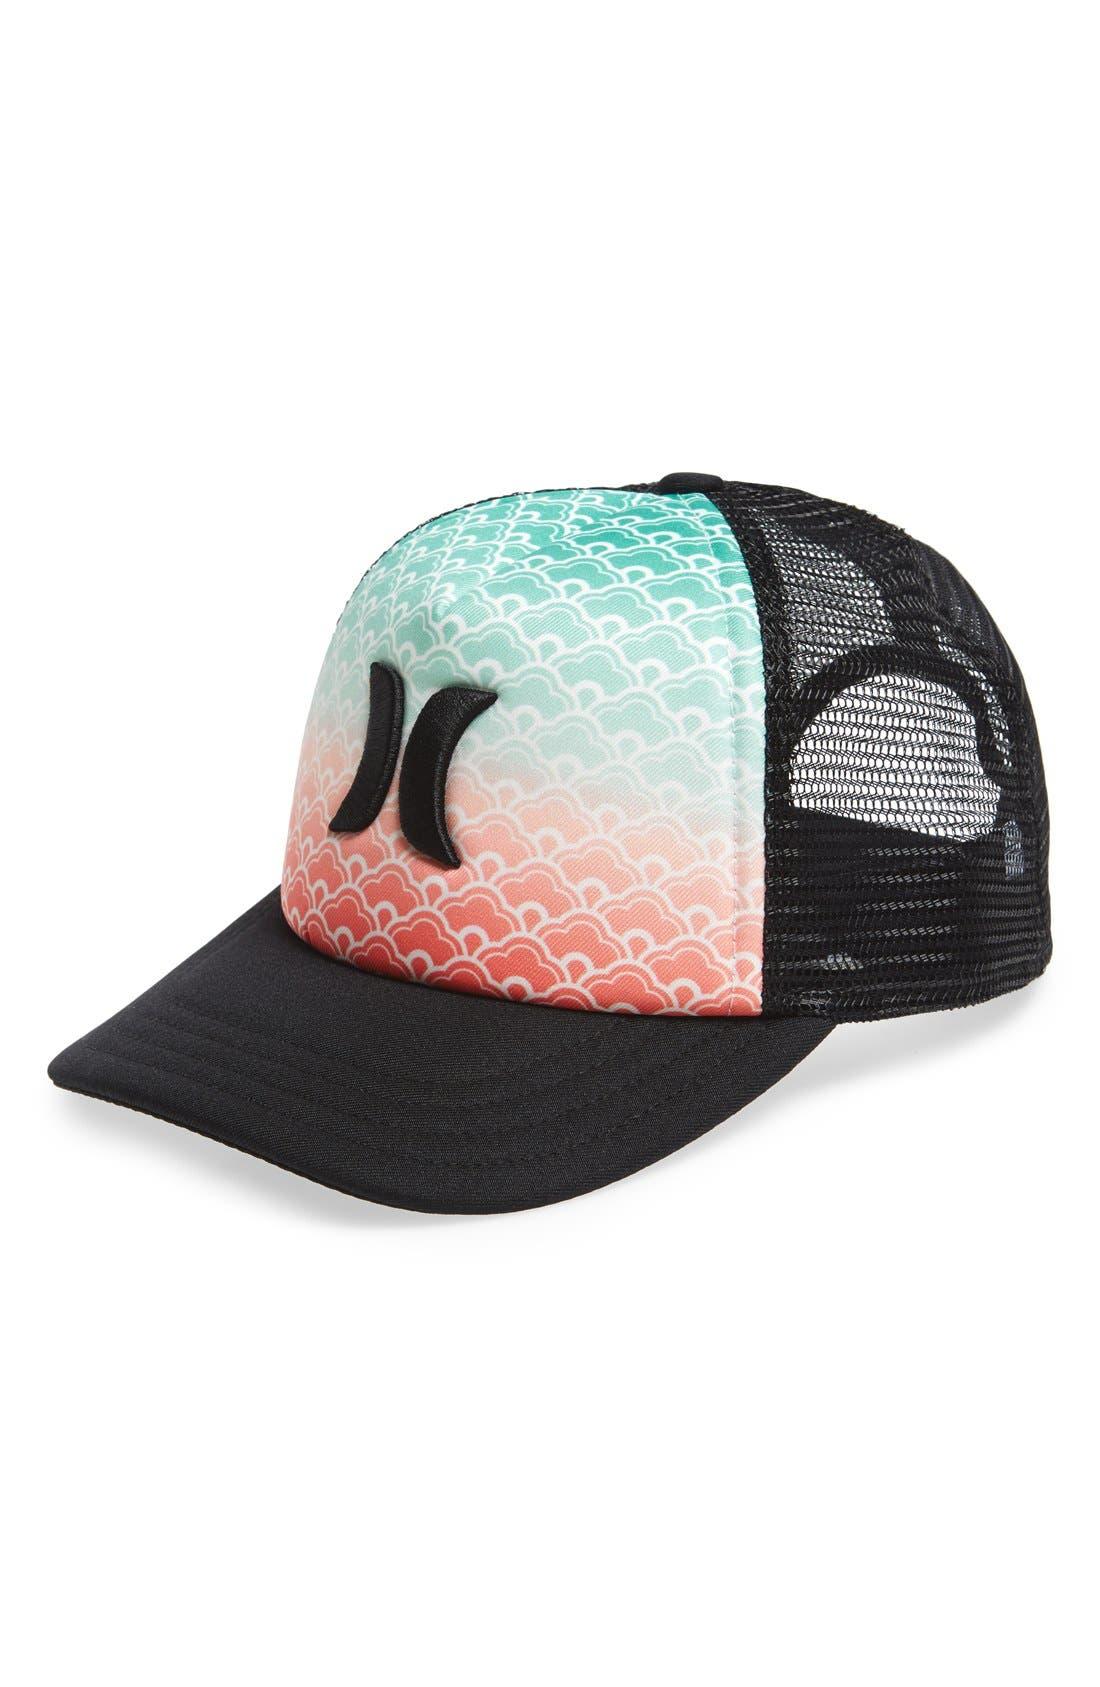 Alternate Image 1 Selected - Hurley 'Americana' Trucker Hat